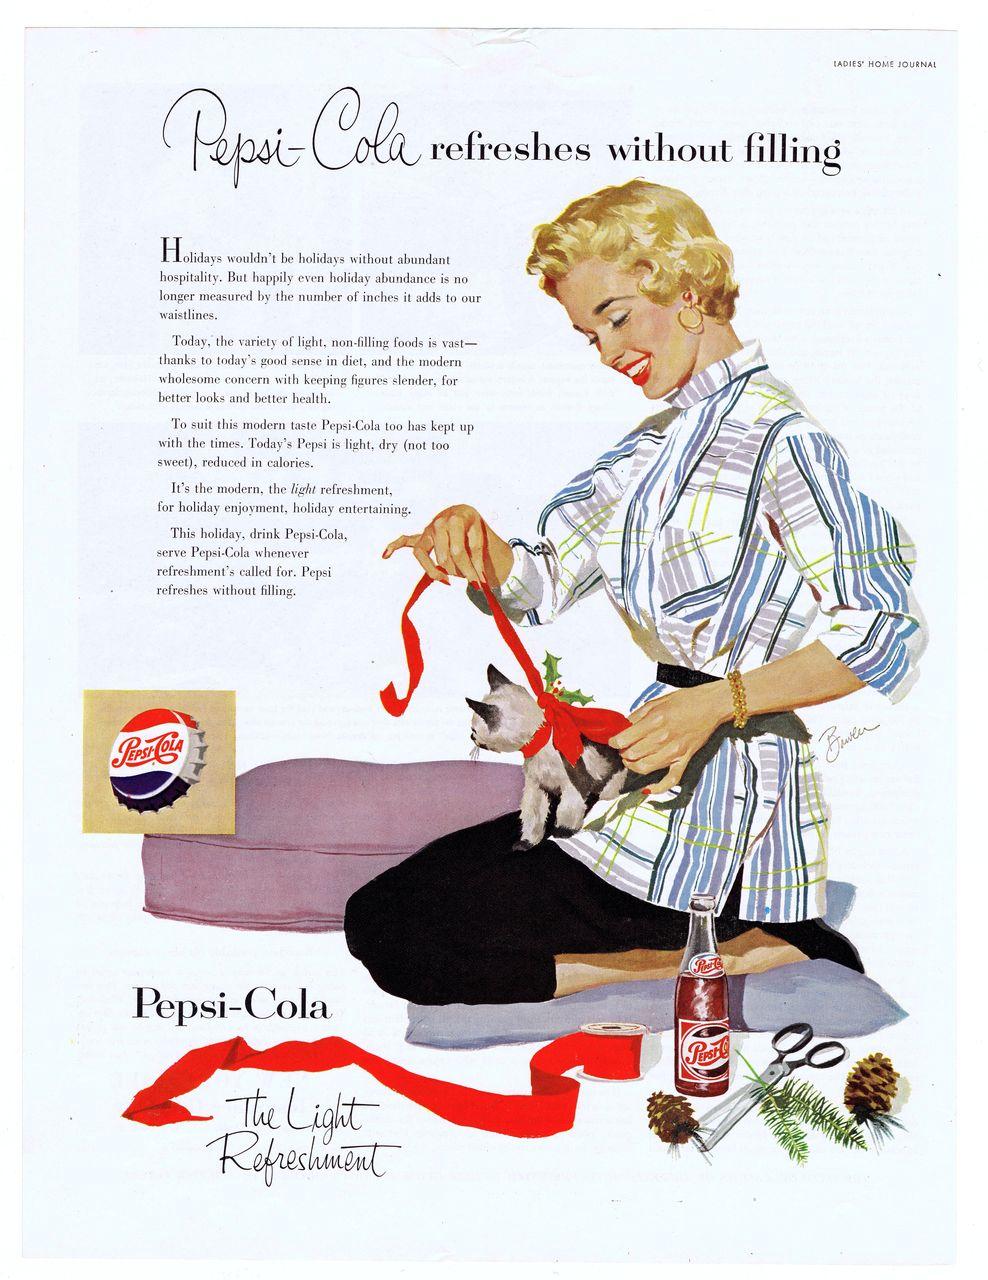 1953 Christmas Ad - PEPSI-COLA - 'Pretty Blonde w/ Kitty Cat'